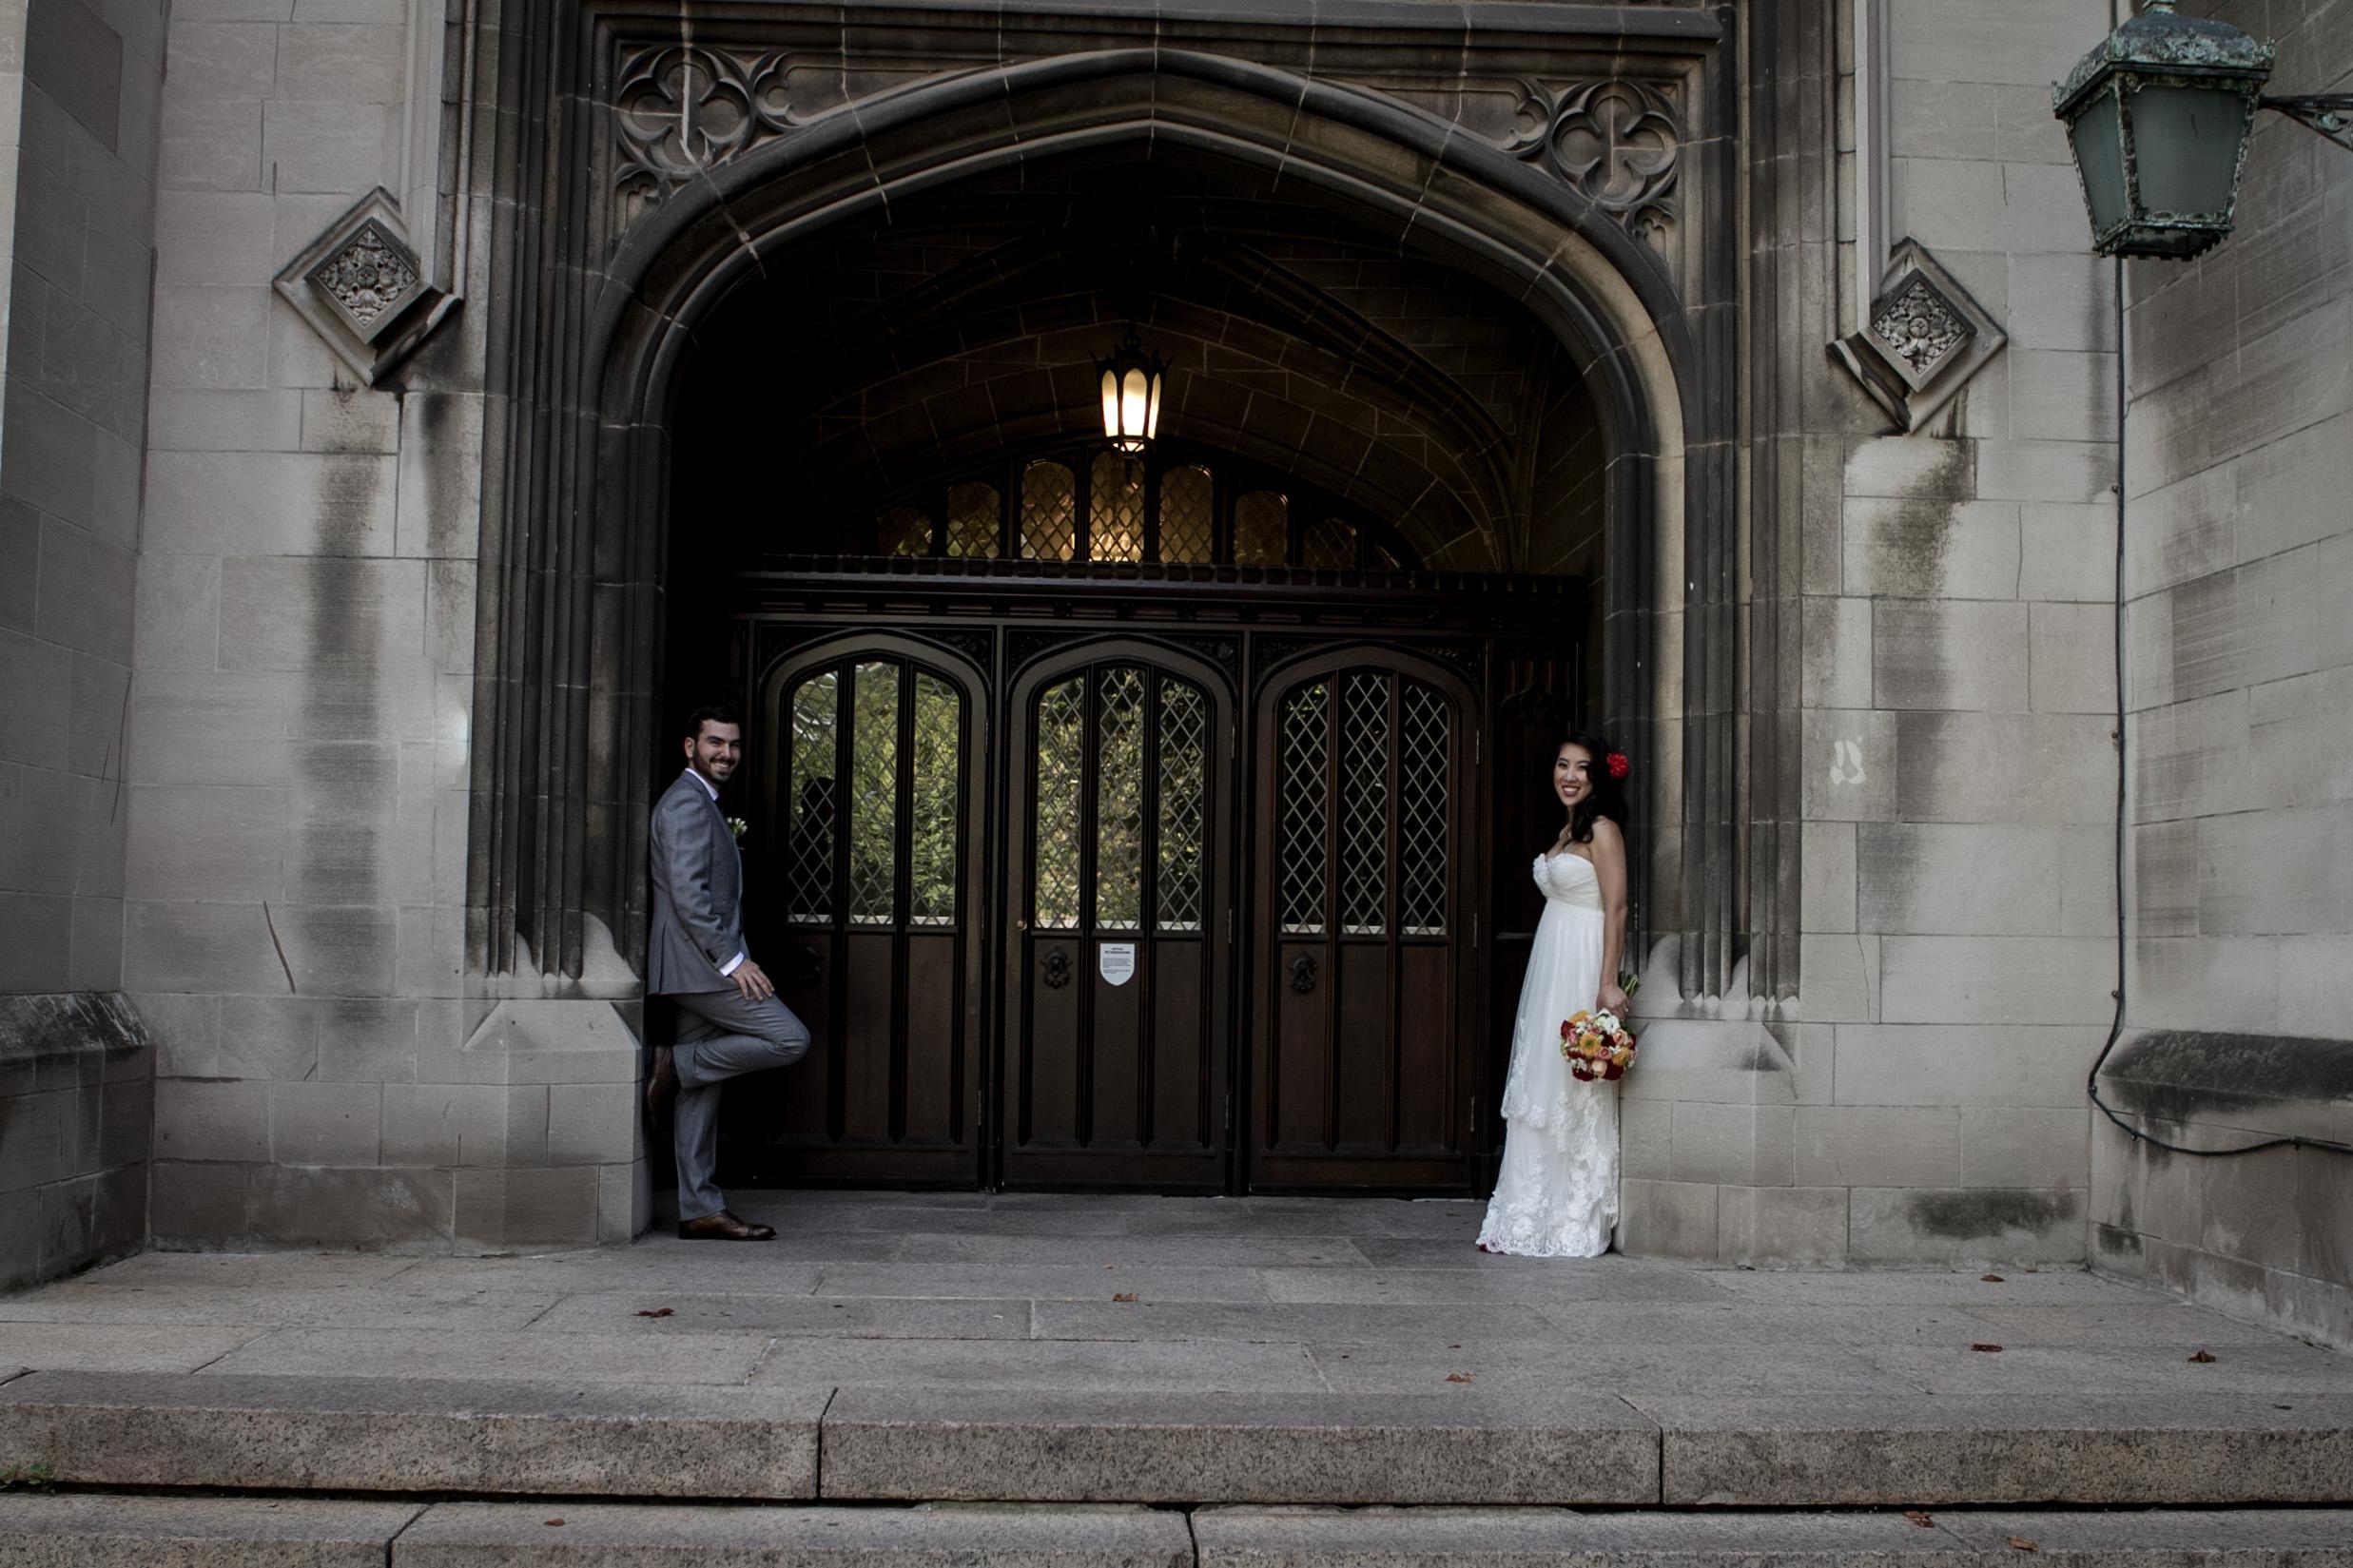 mayon & martin university of chicago loft on lake wedding summer -008.jpg